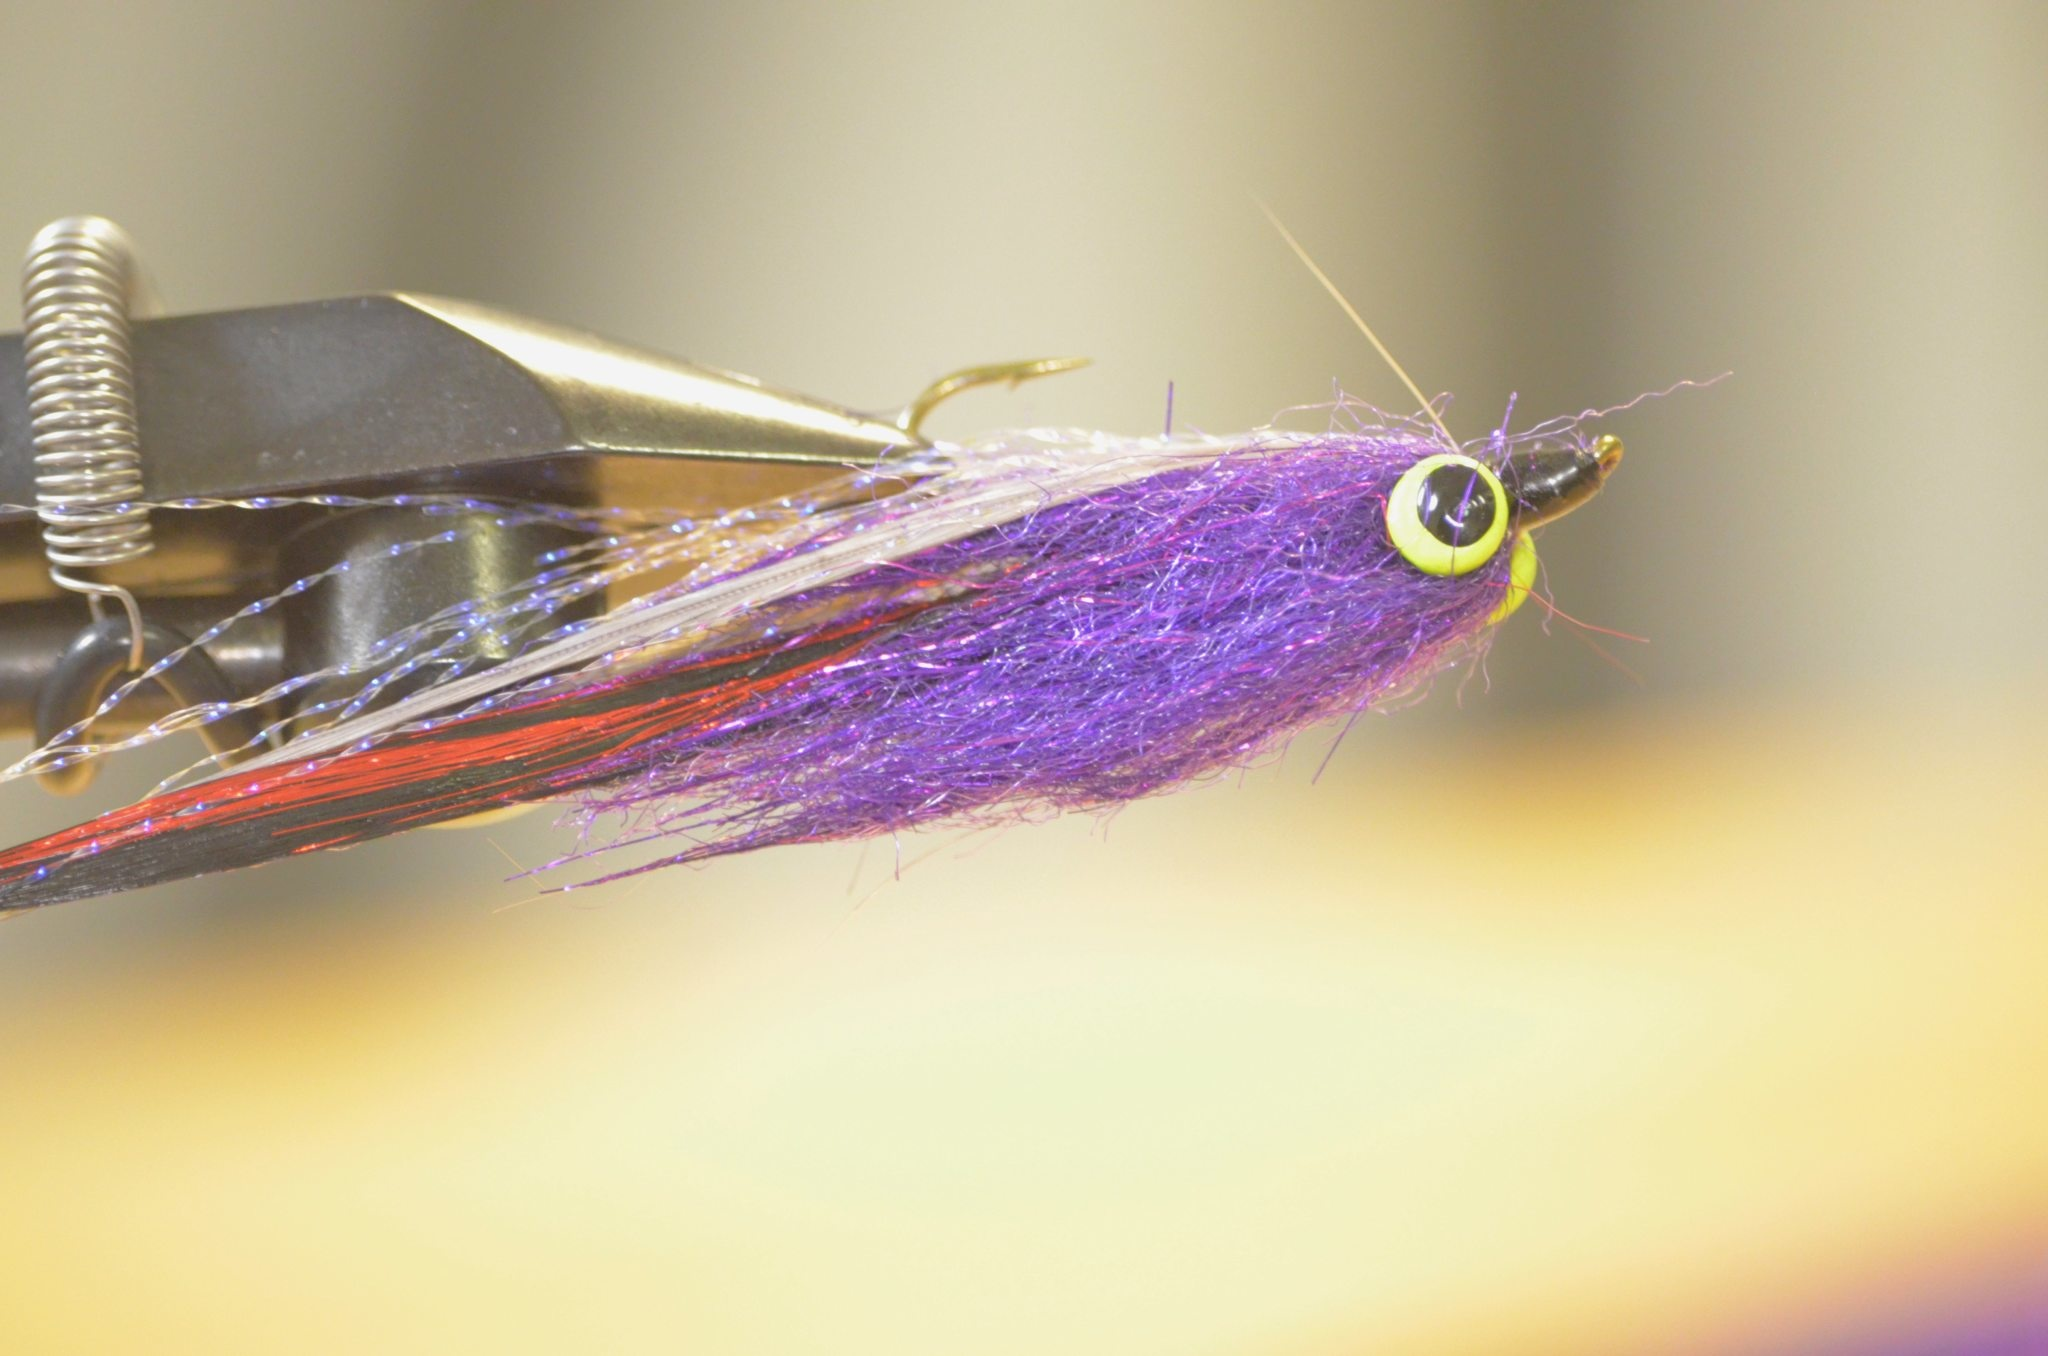 Urban Angler Fly Tying Kit - EP Anadro Home Invader